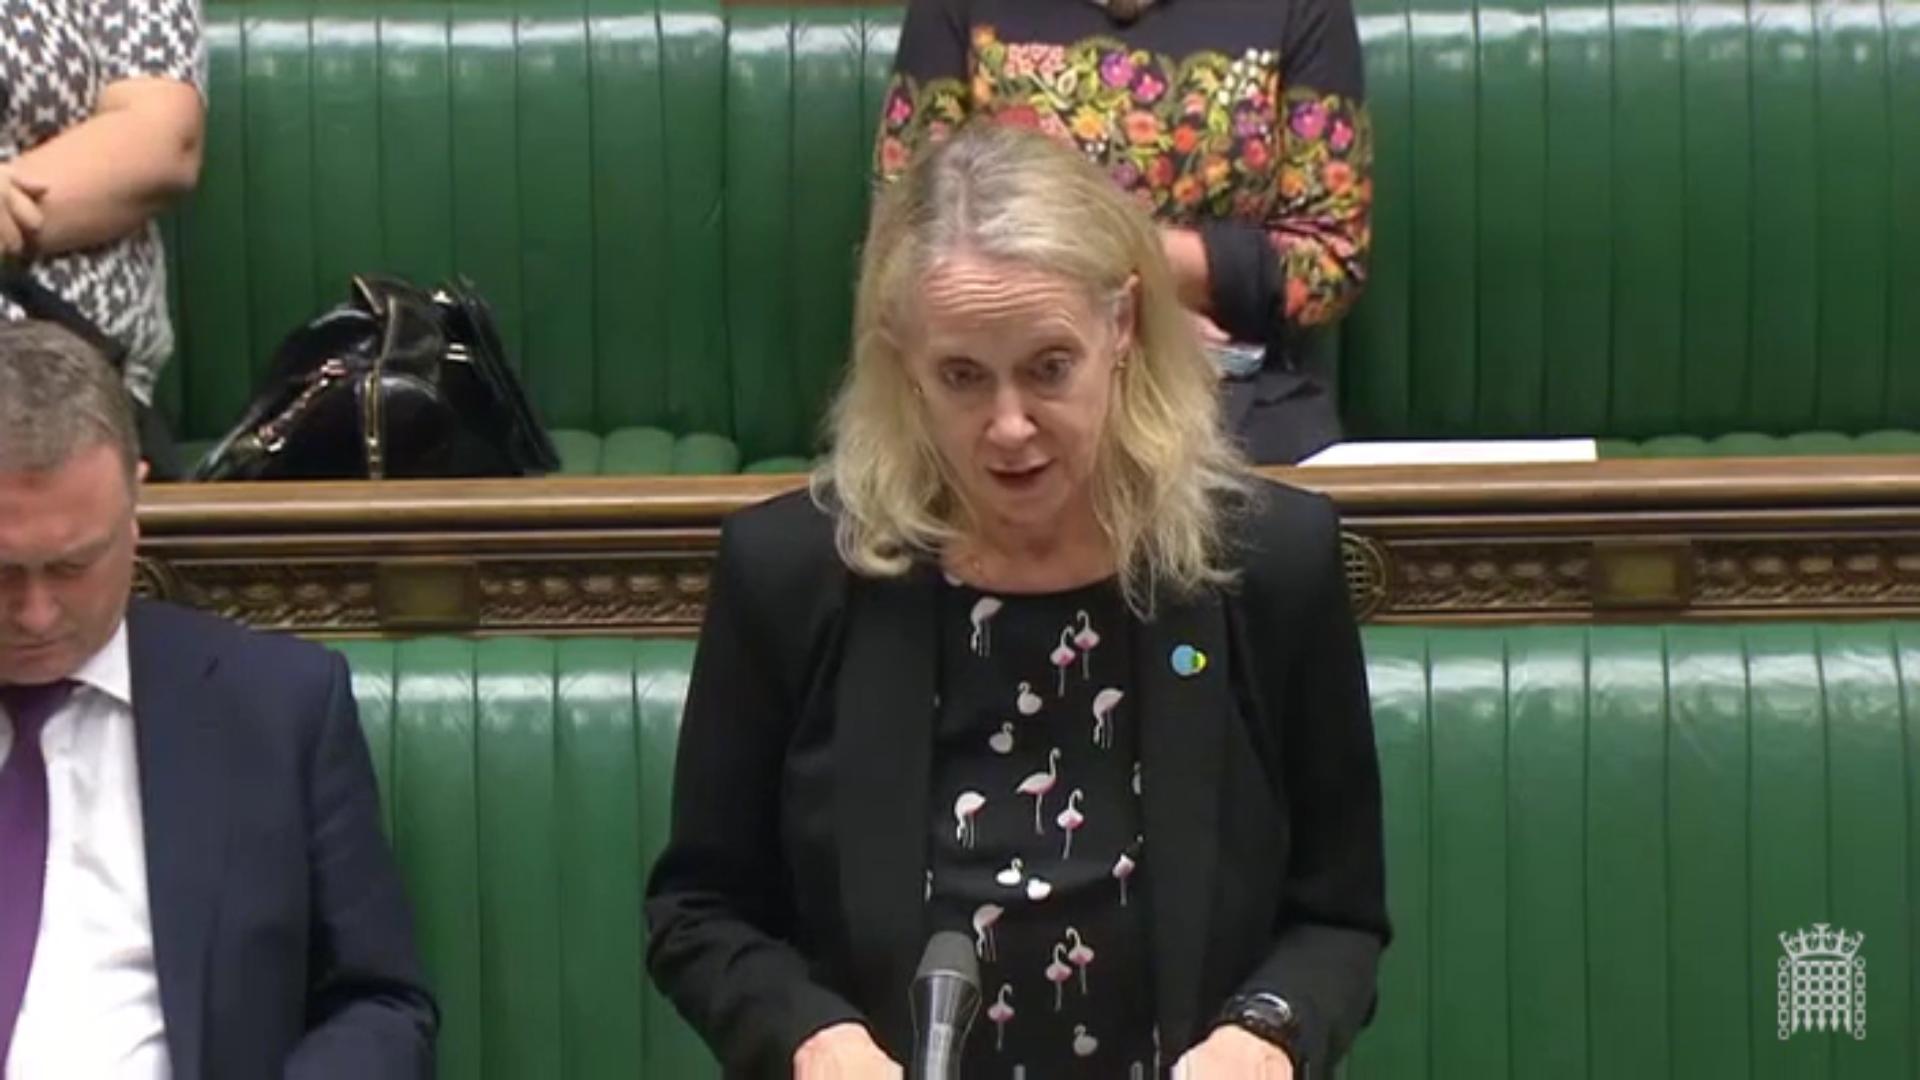 Liz_McInnes_MP_in_parliament_-_votes_at_16_debate.png